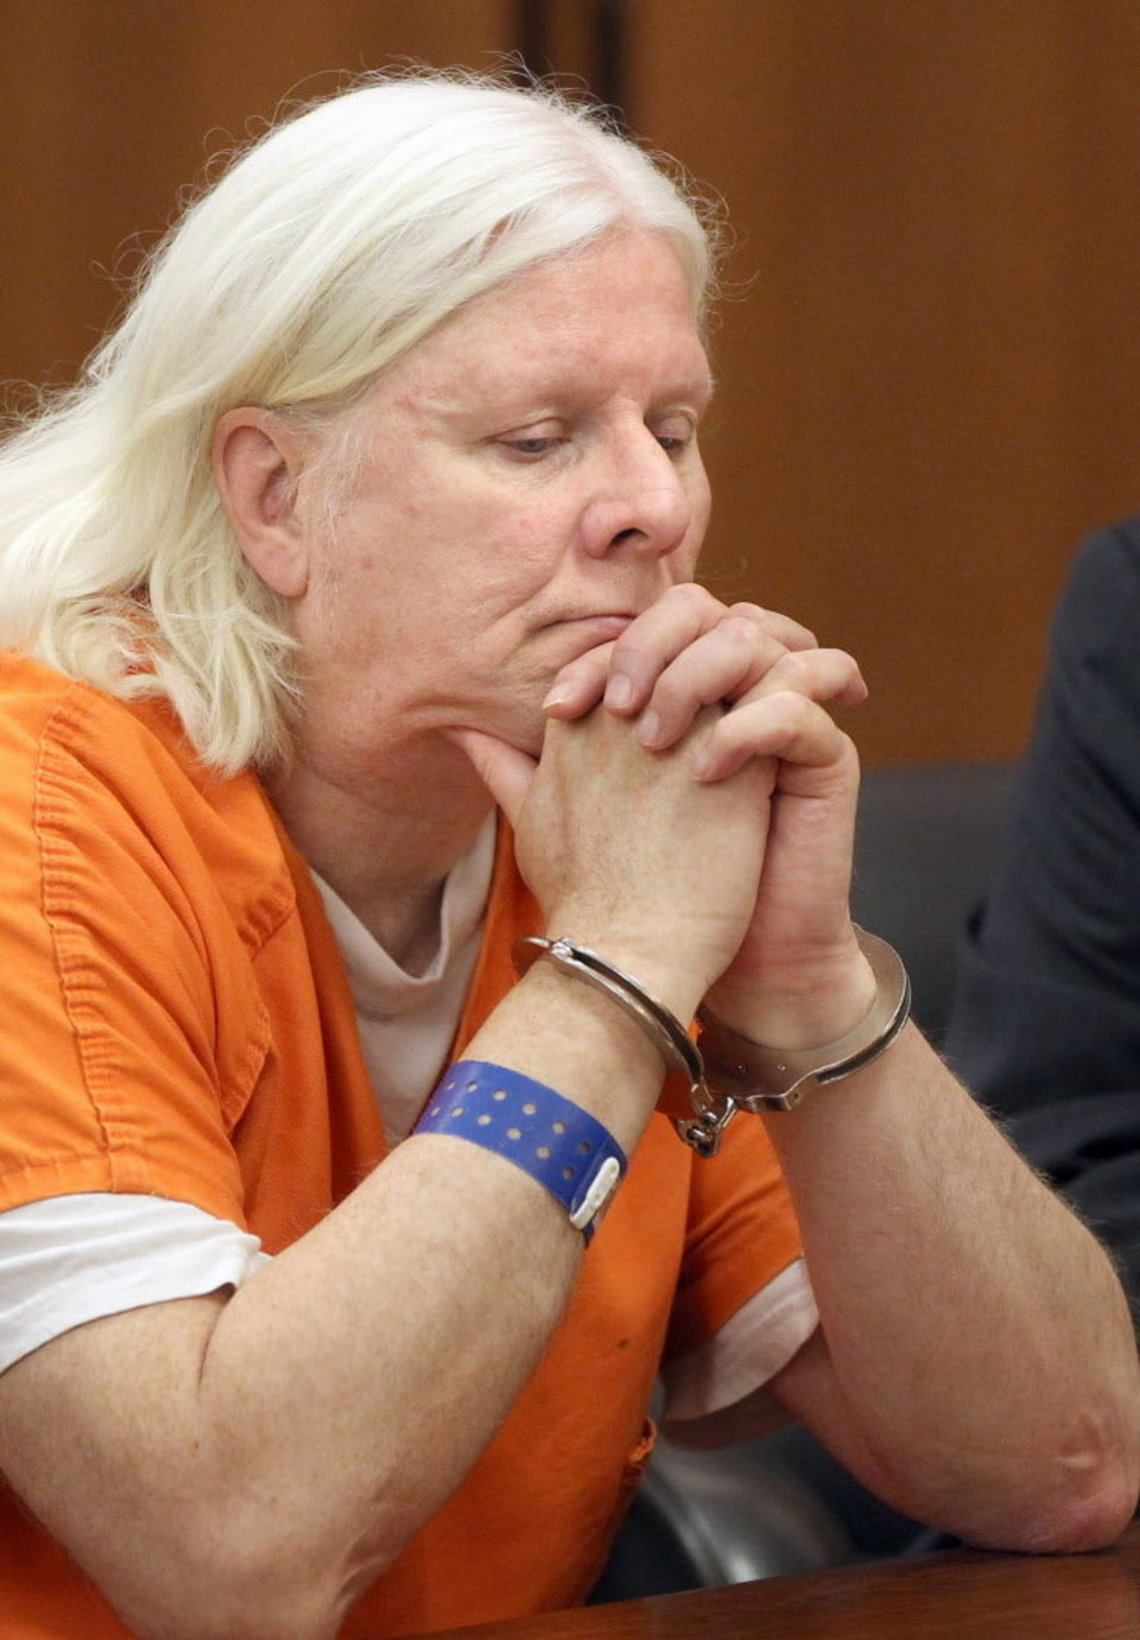 Michael Keenan during his hearing in 2012.